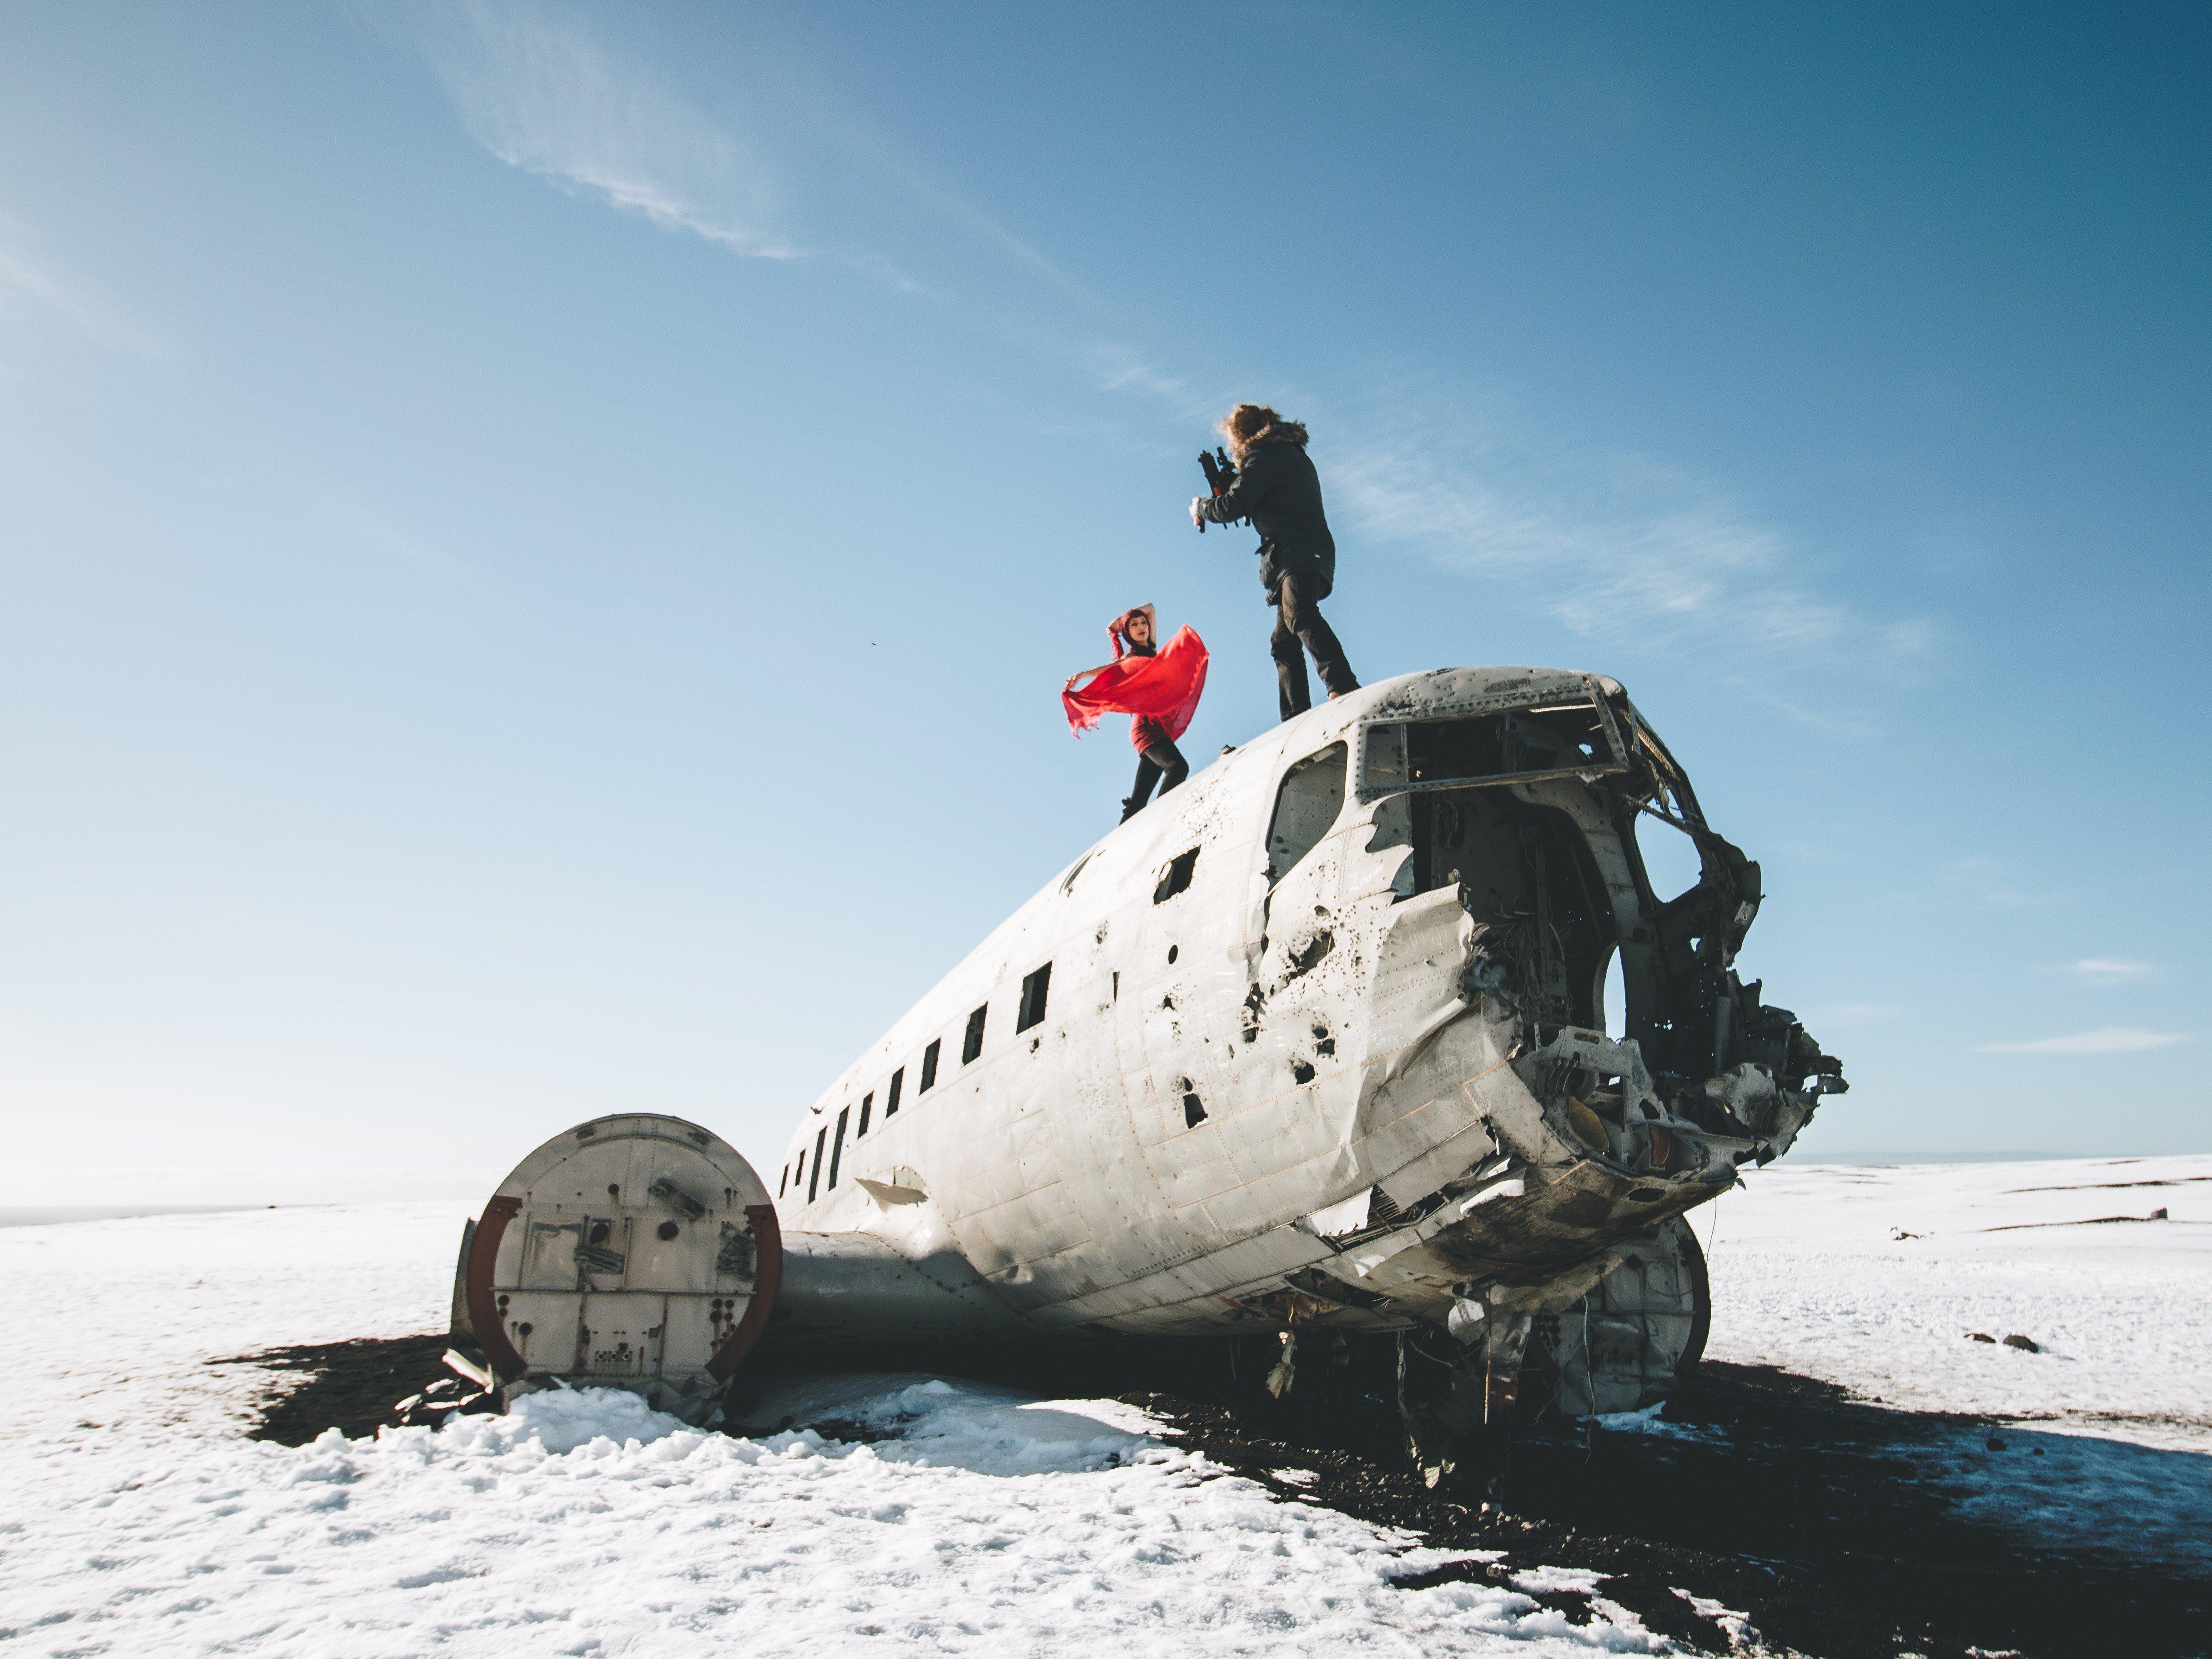 plane wreck featured in justin bieber music video